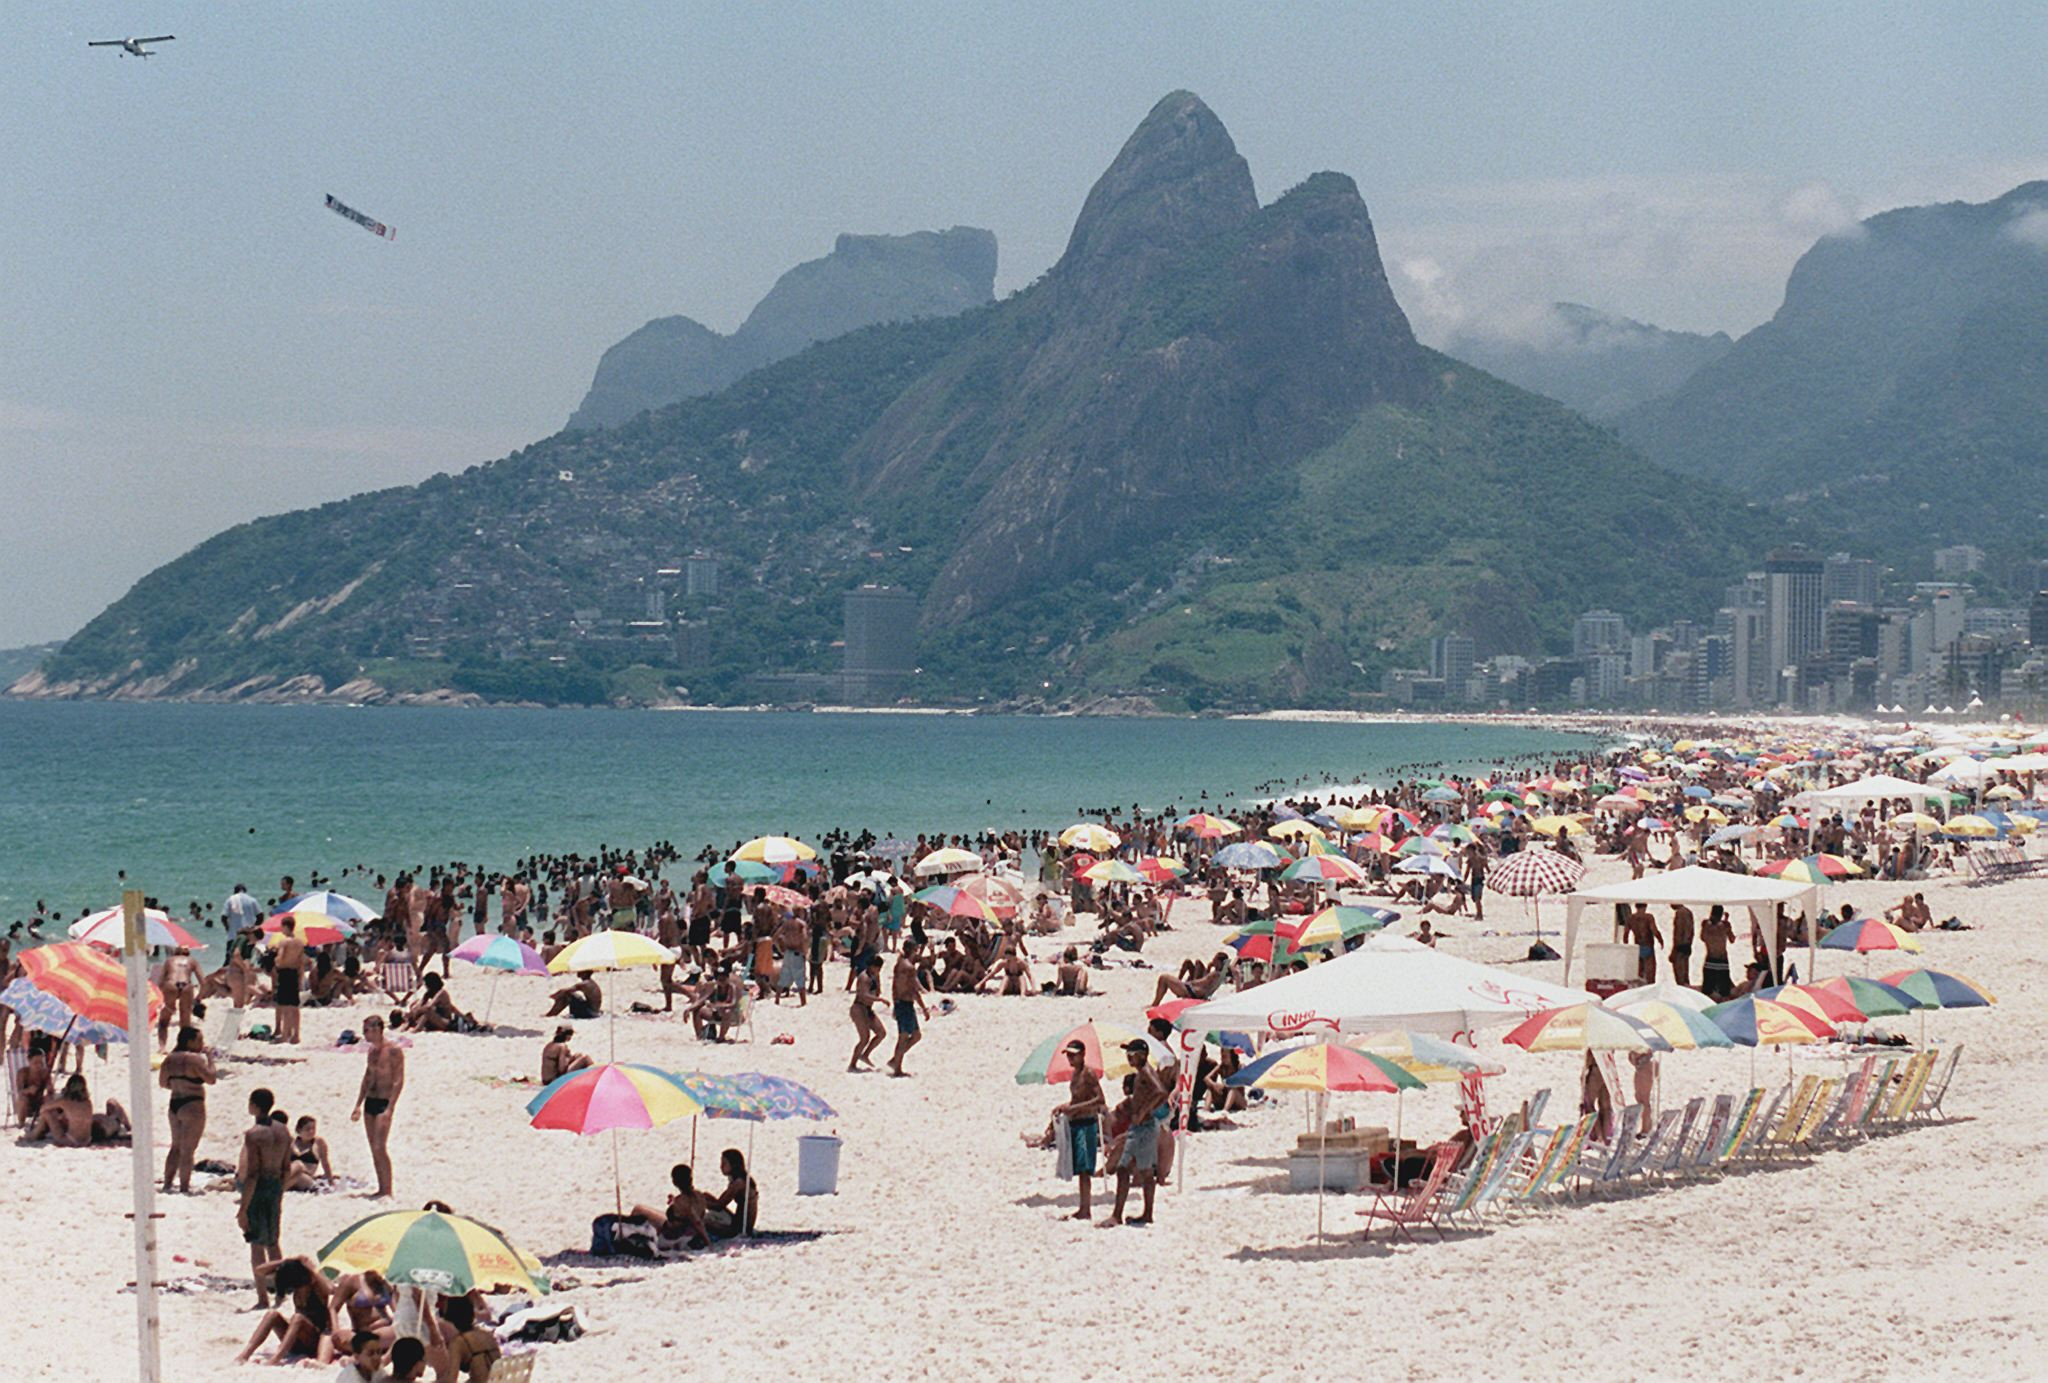 Beachgoers at Rio de Janeiro's Ipanema Beach take